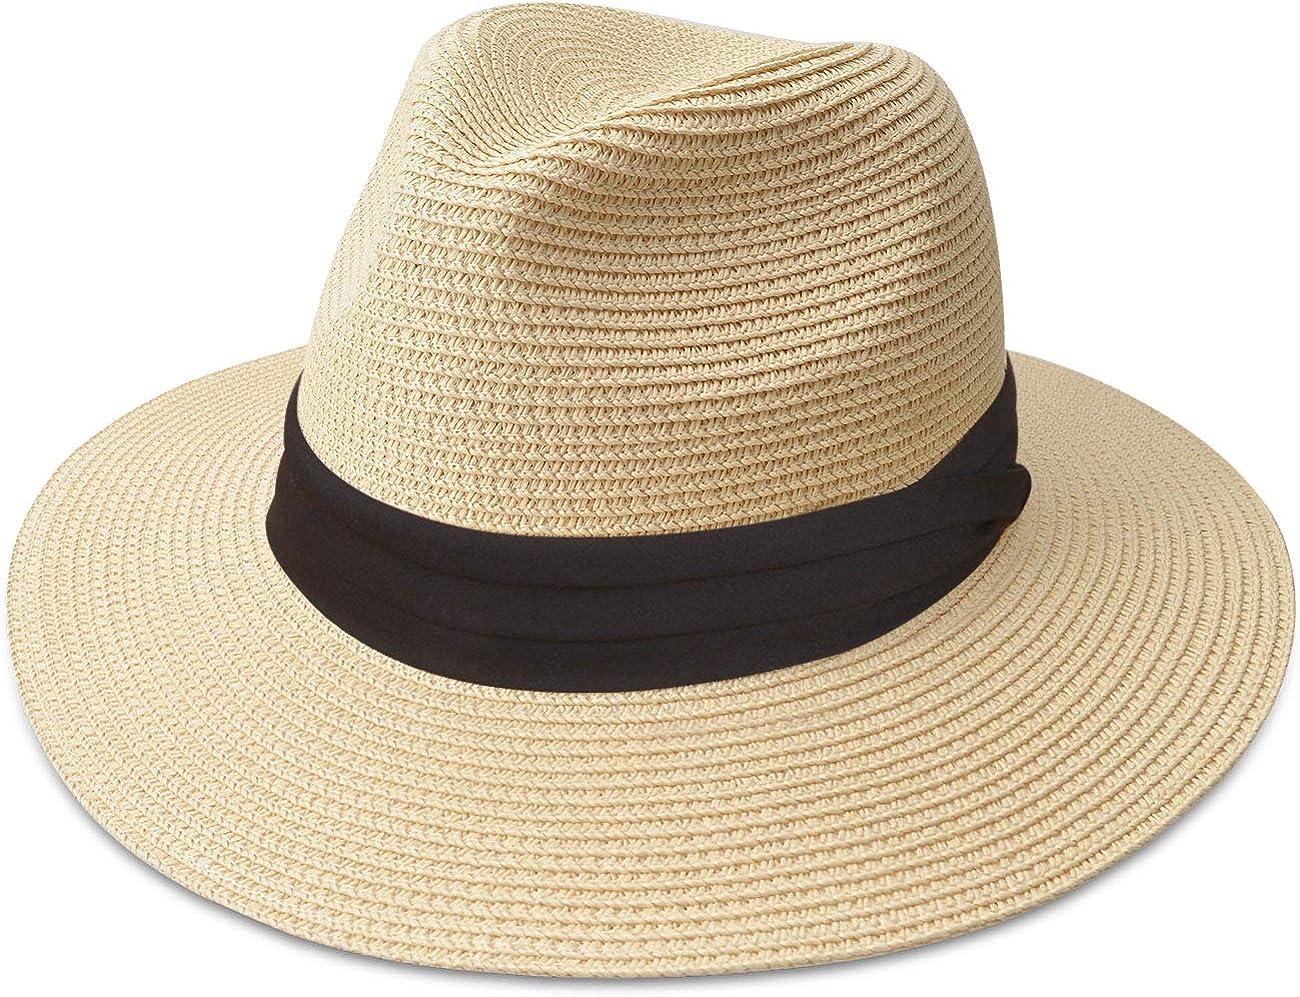 Wenyun Summer Wave Wide Brim Sun Hat Straw Hats Beach Hats Cap Reversible Hats for Women and Girls